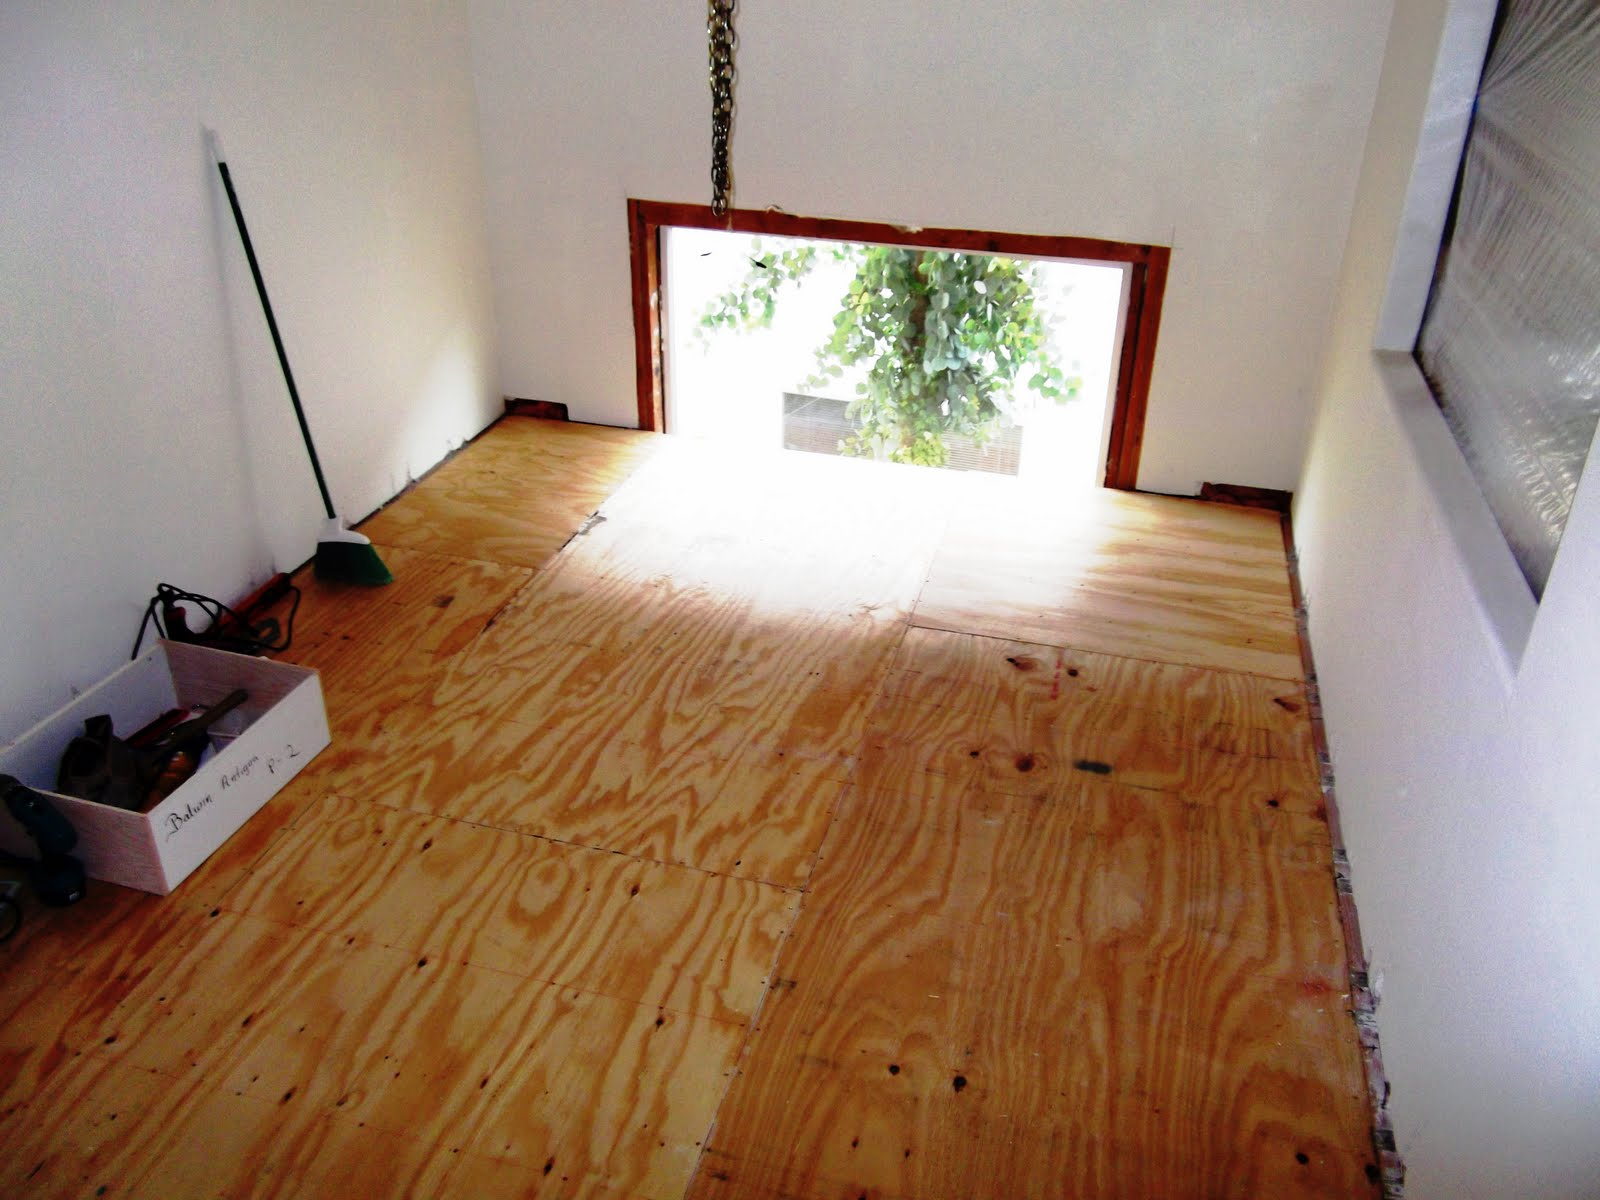 A proper tea room finished floor